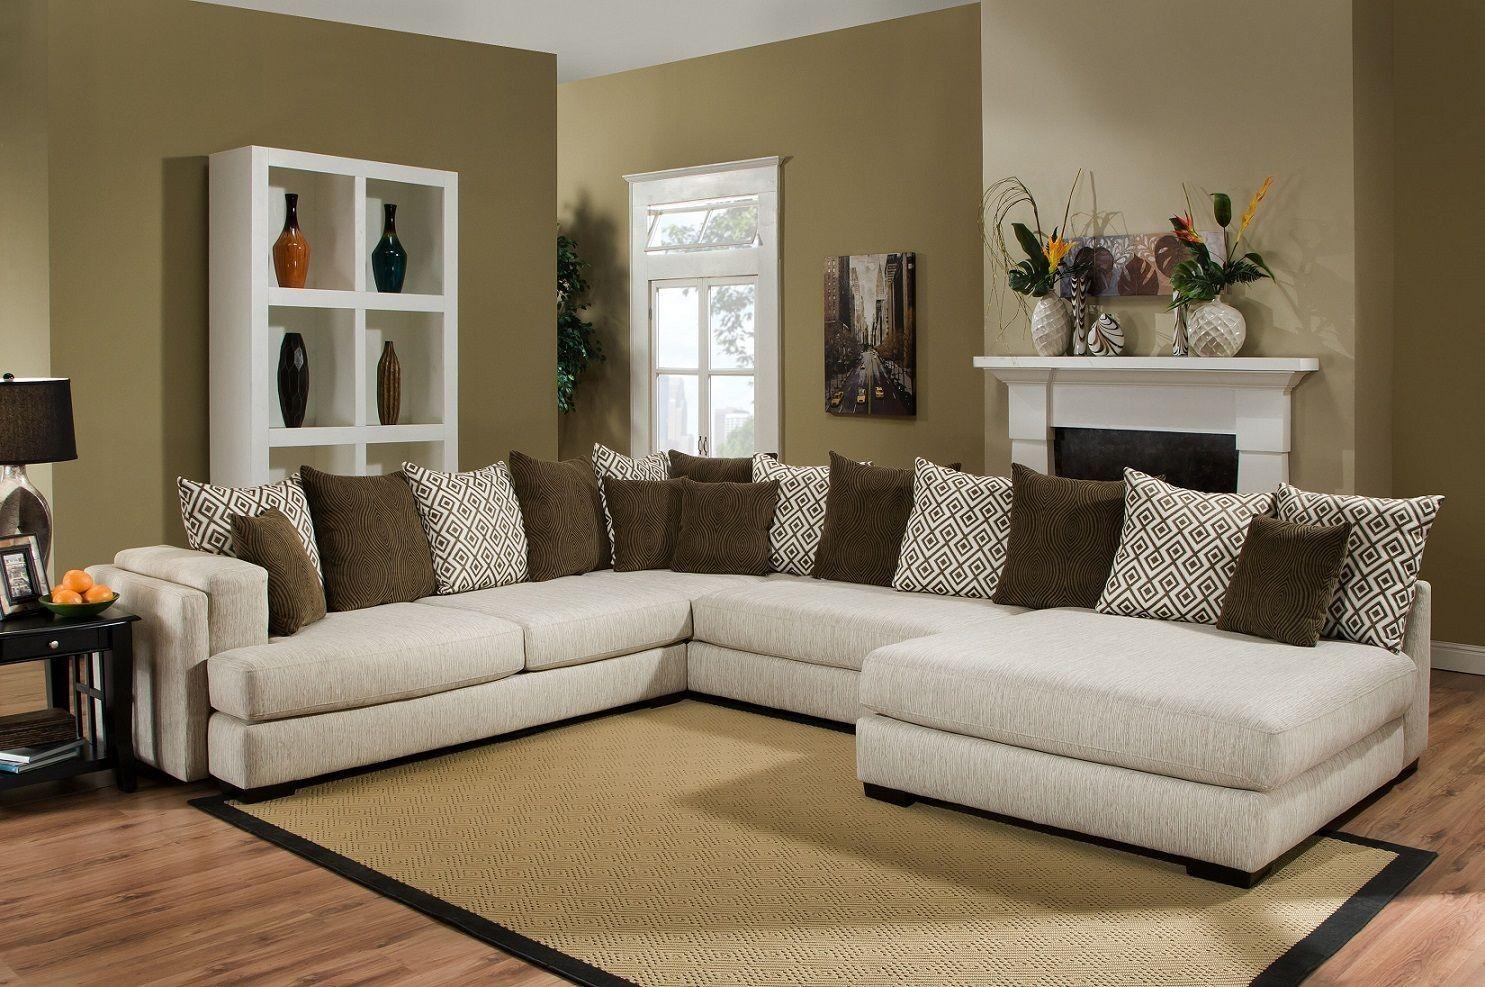 Chelsea Home Furniture Katy Sectional Sofa